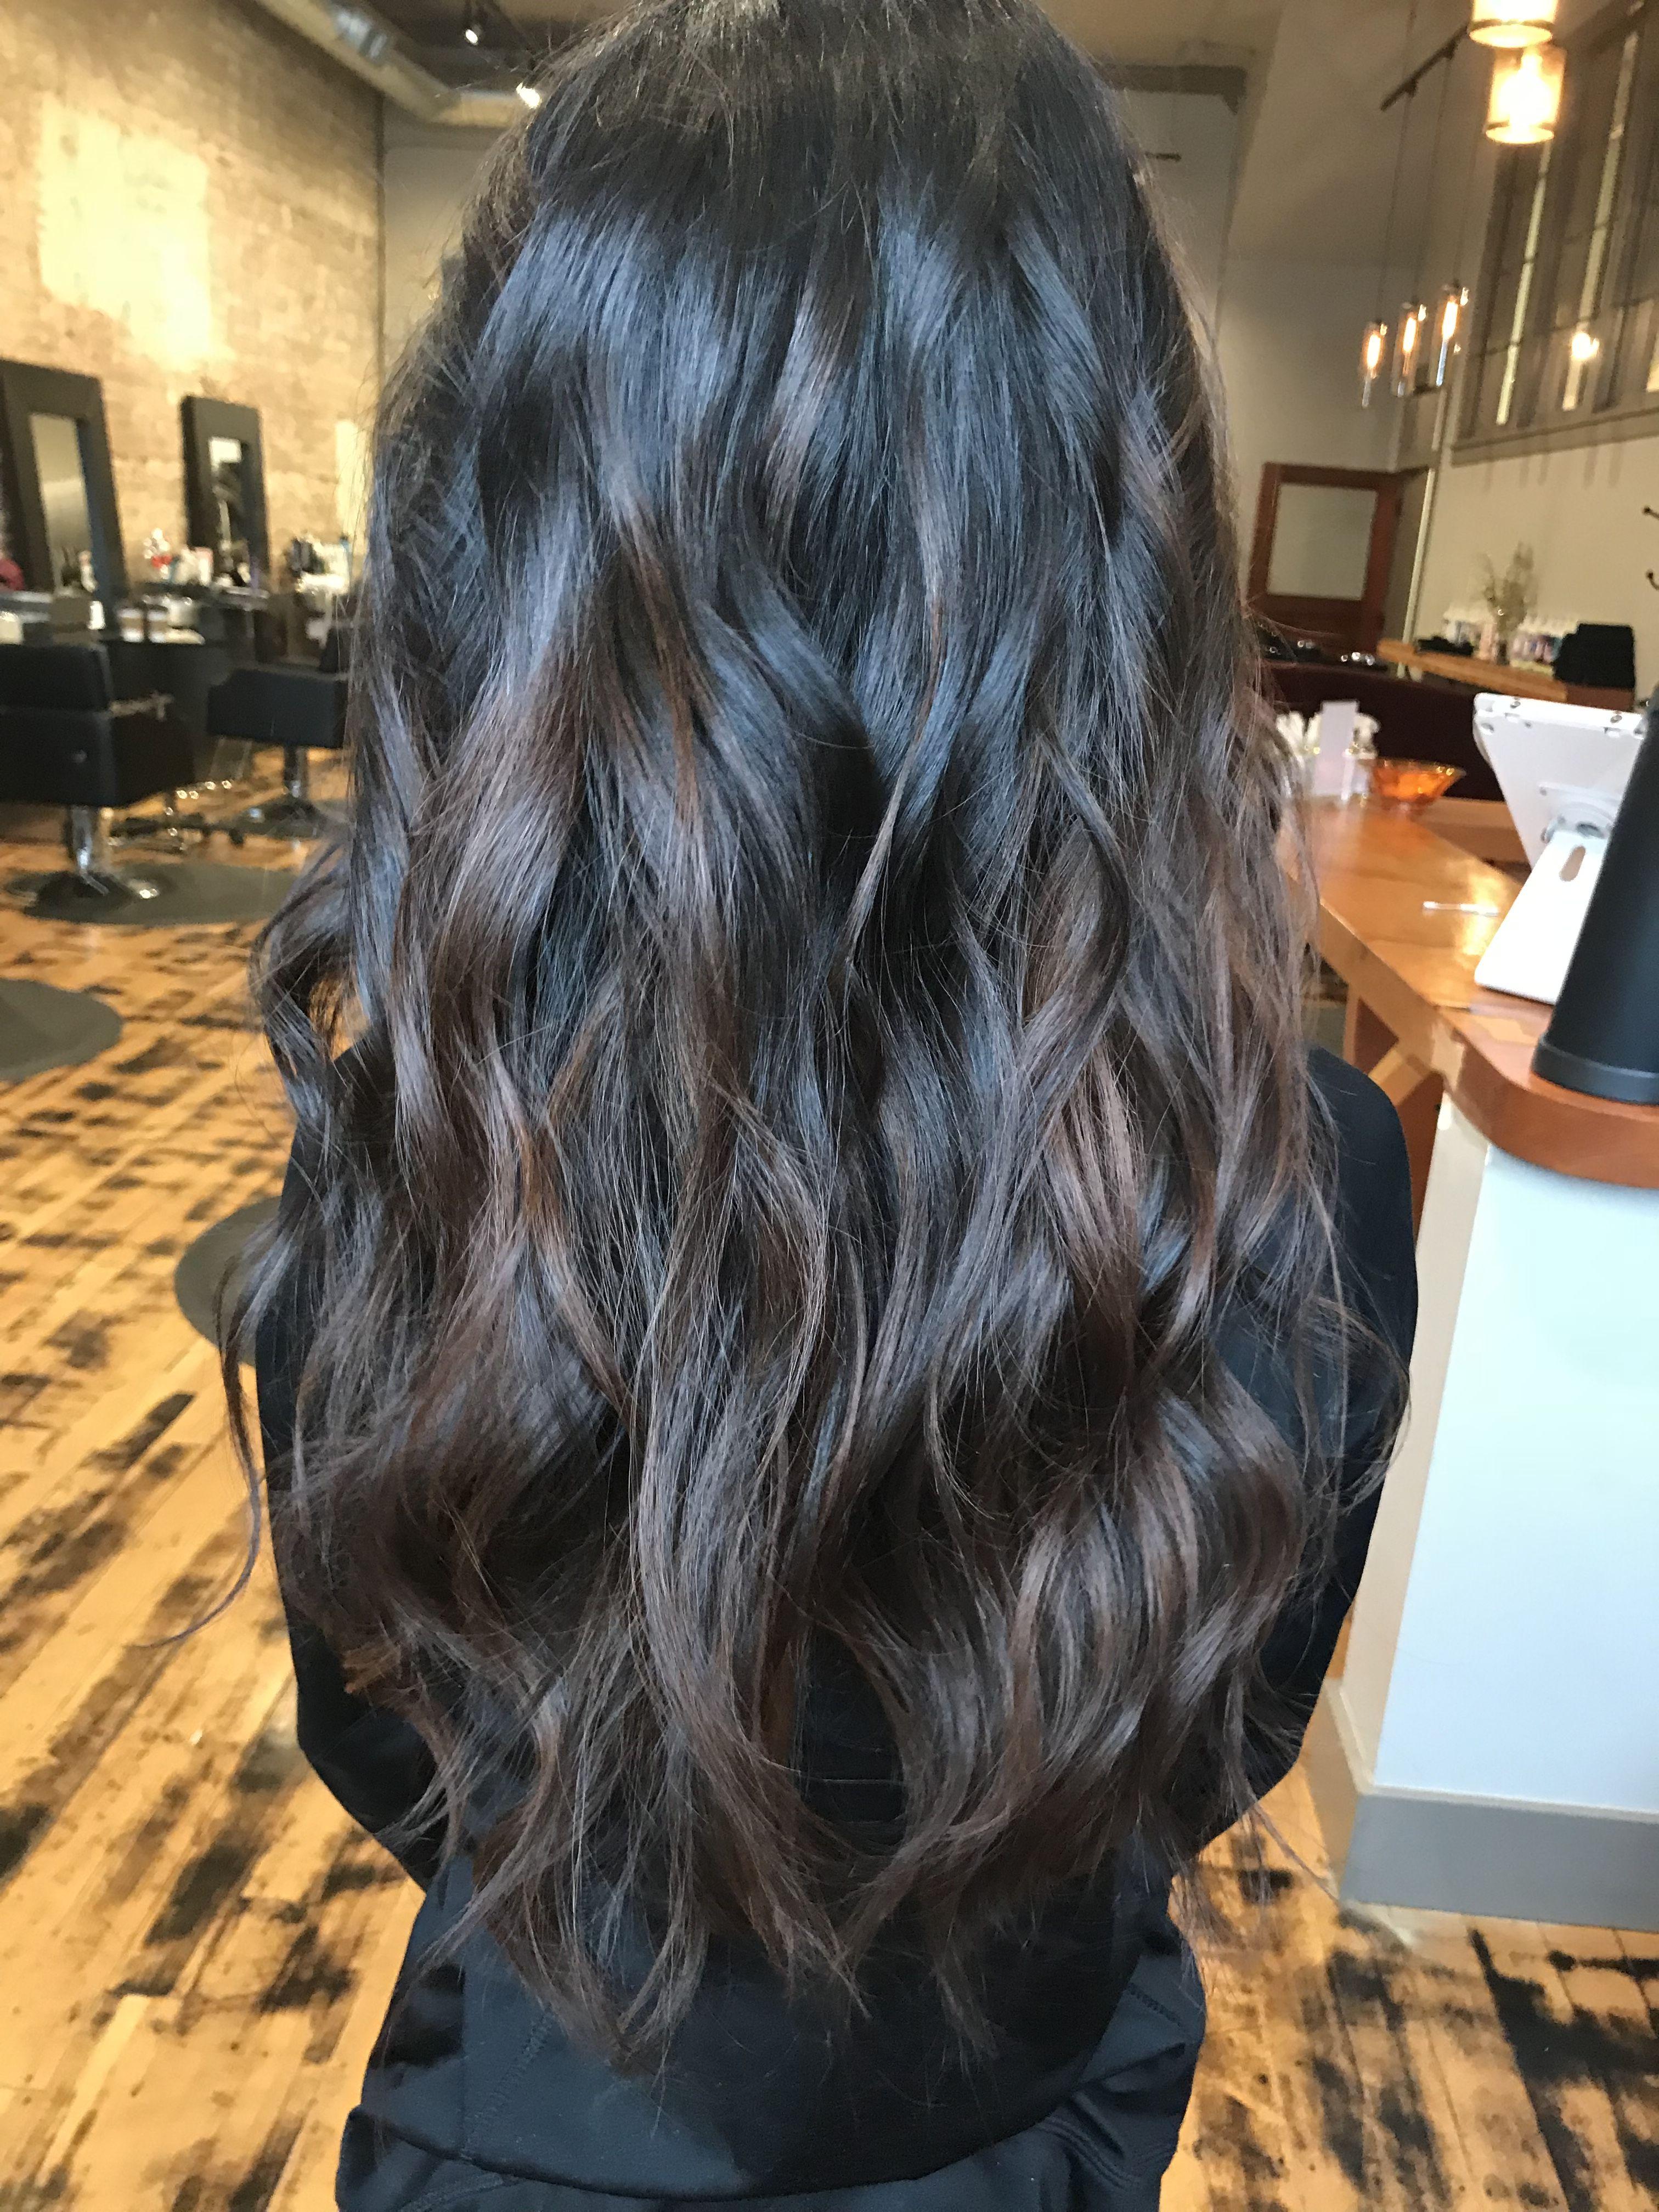 Natural Balayage Dark Brown Hair Brown Balayage Carmel Hair Carmel Hair Brown Balayage Balayage